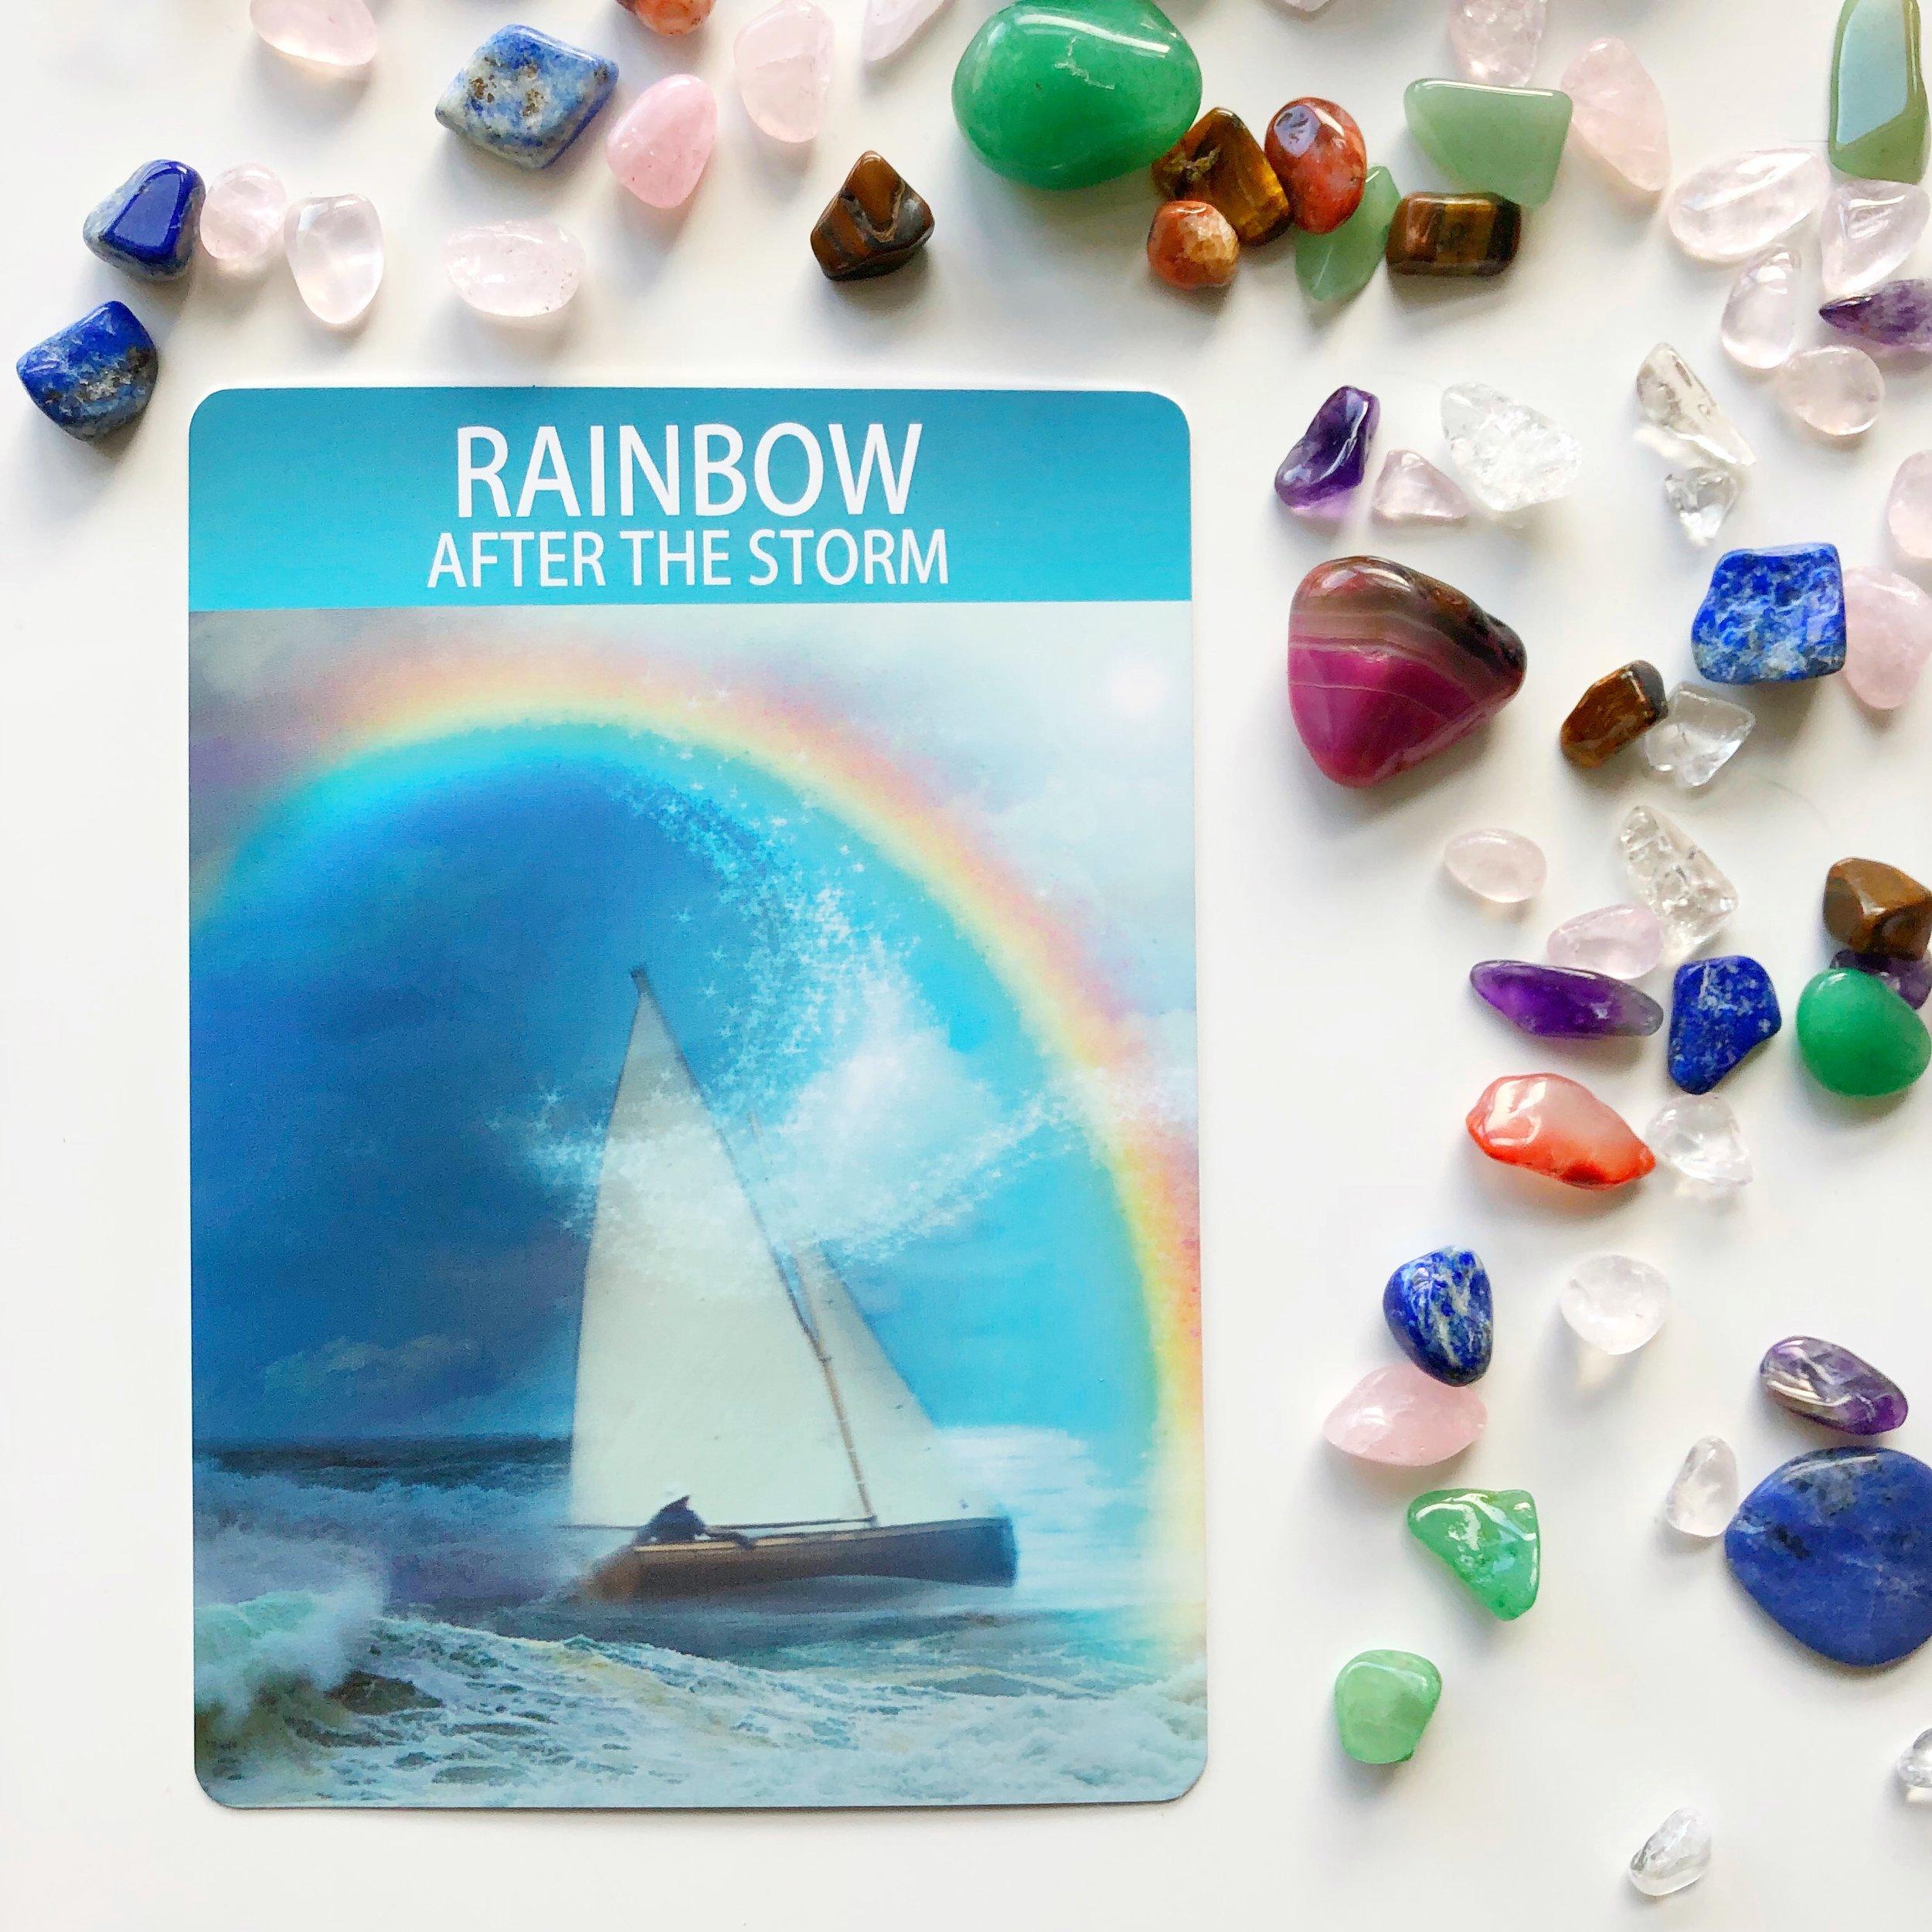 RainbowAfterTheStorm.jpg